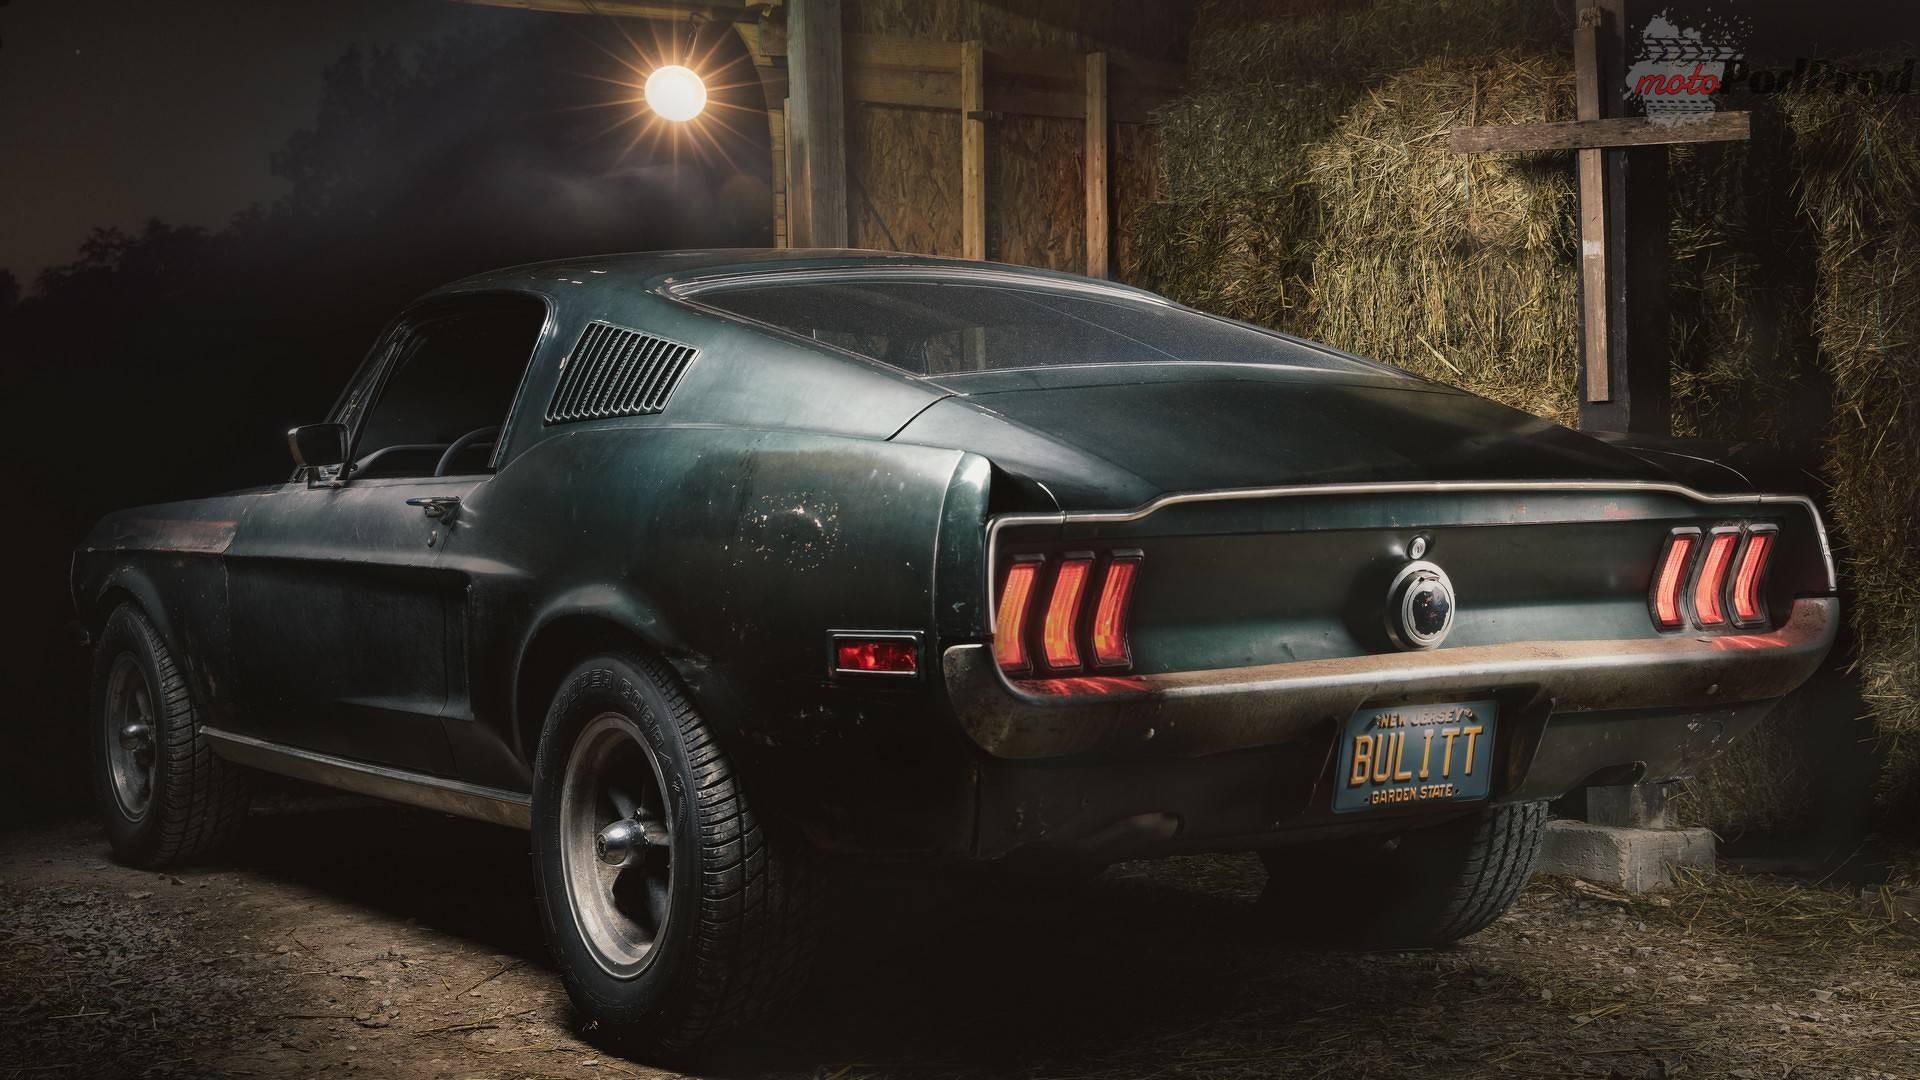 1968 ford mustang bullitt original movie car Goodwood Festival of Speed   spodziewane premiery